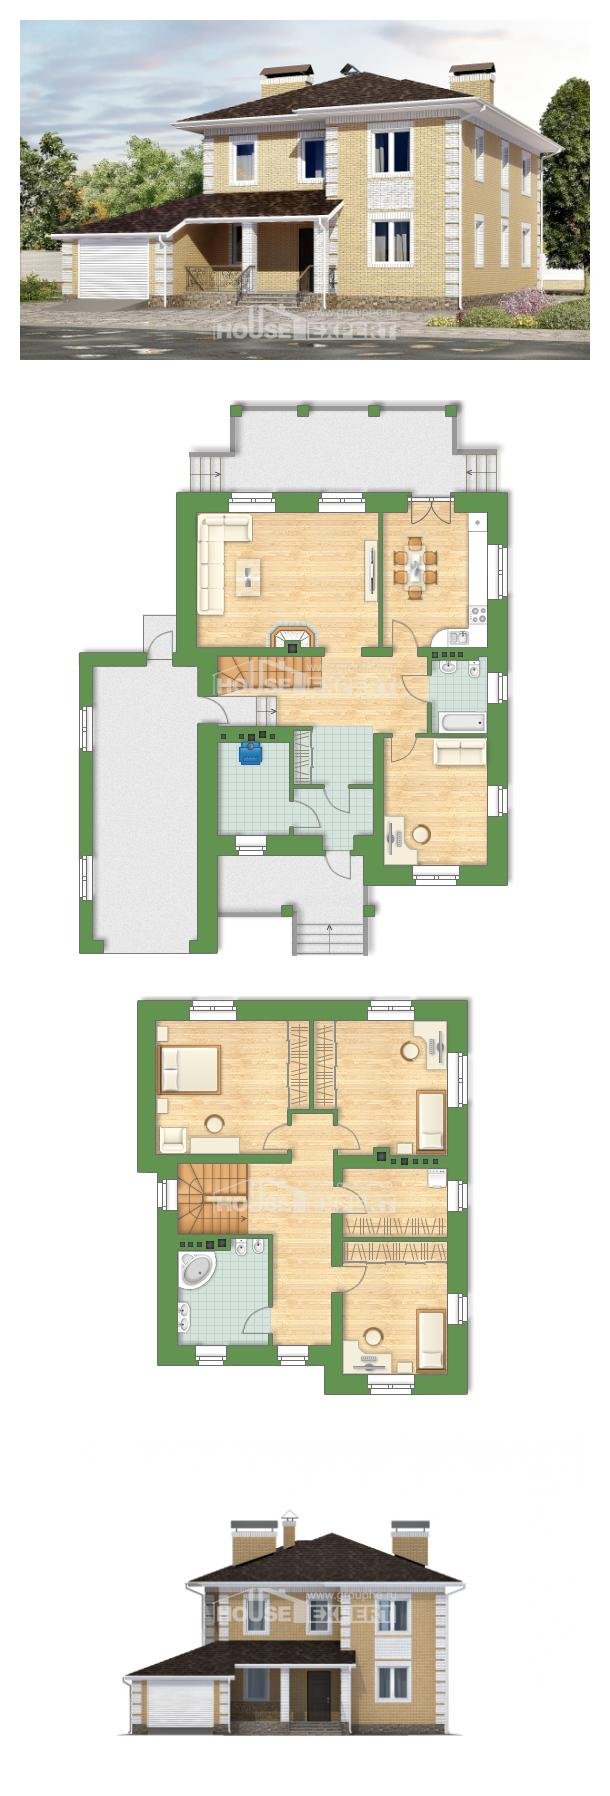 Projekt domu 220-006-L | House Expert